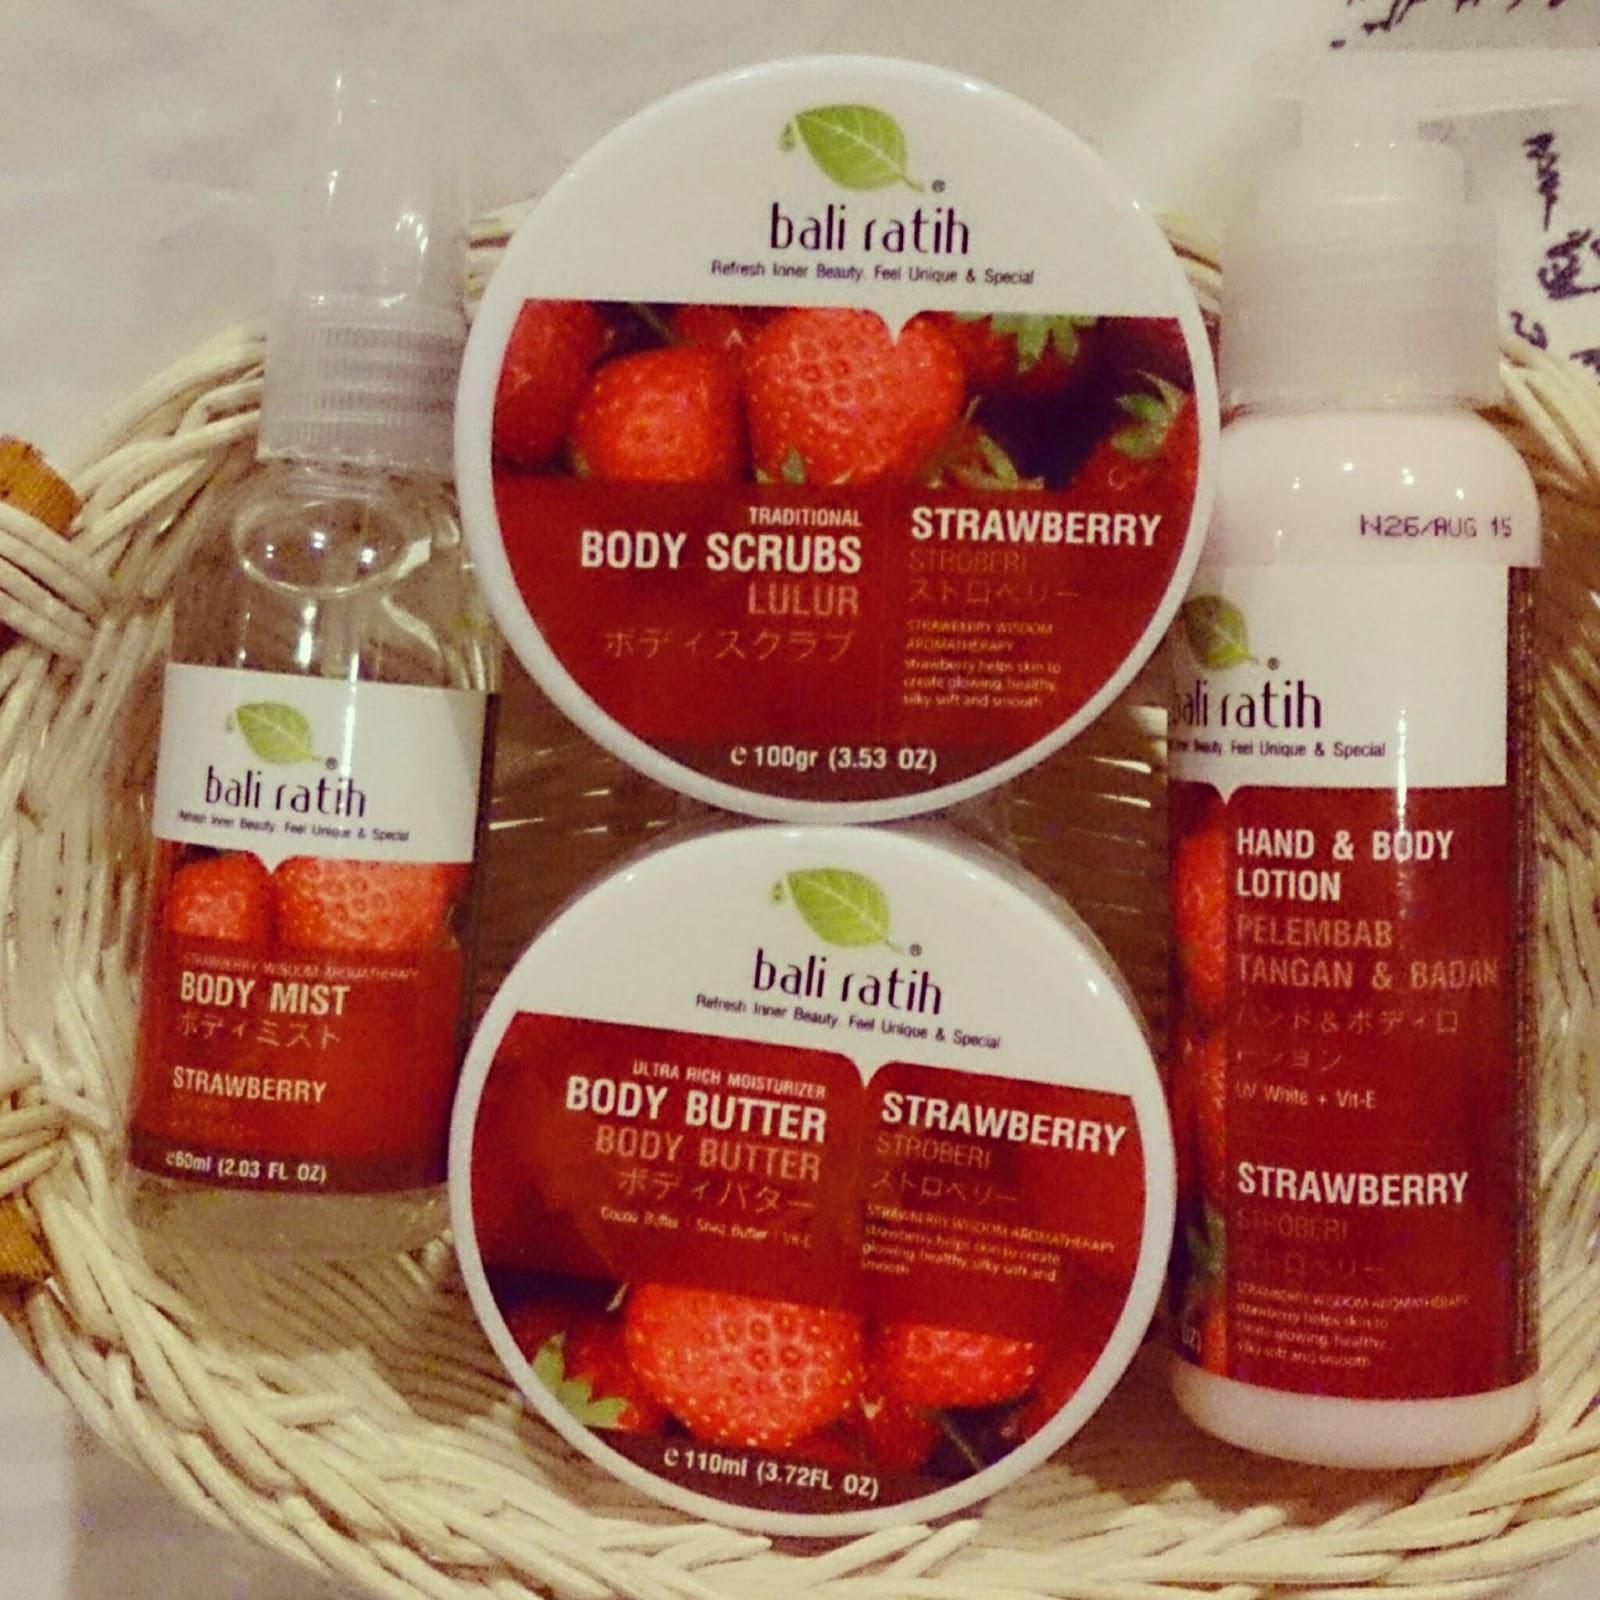 Bali Ratih Set Strawberry Lulur Malaysia Body Lotion Enjoy The Benefit Of On Care